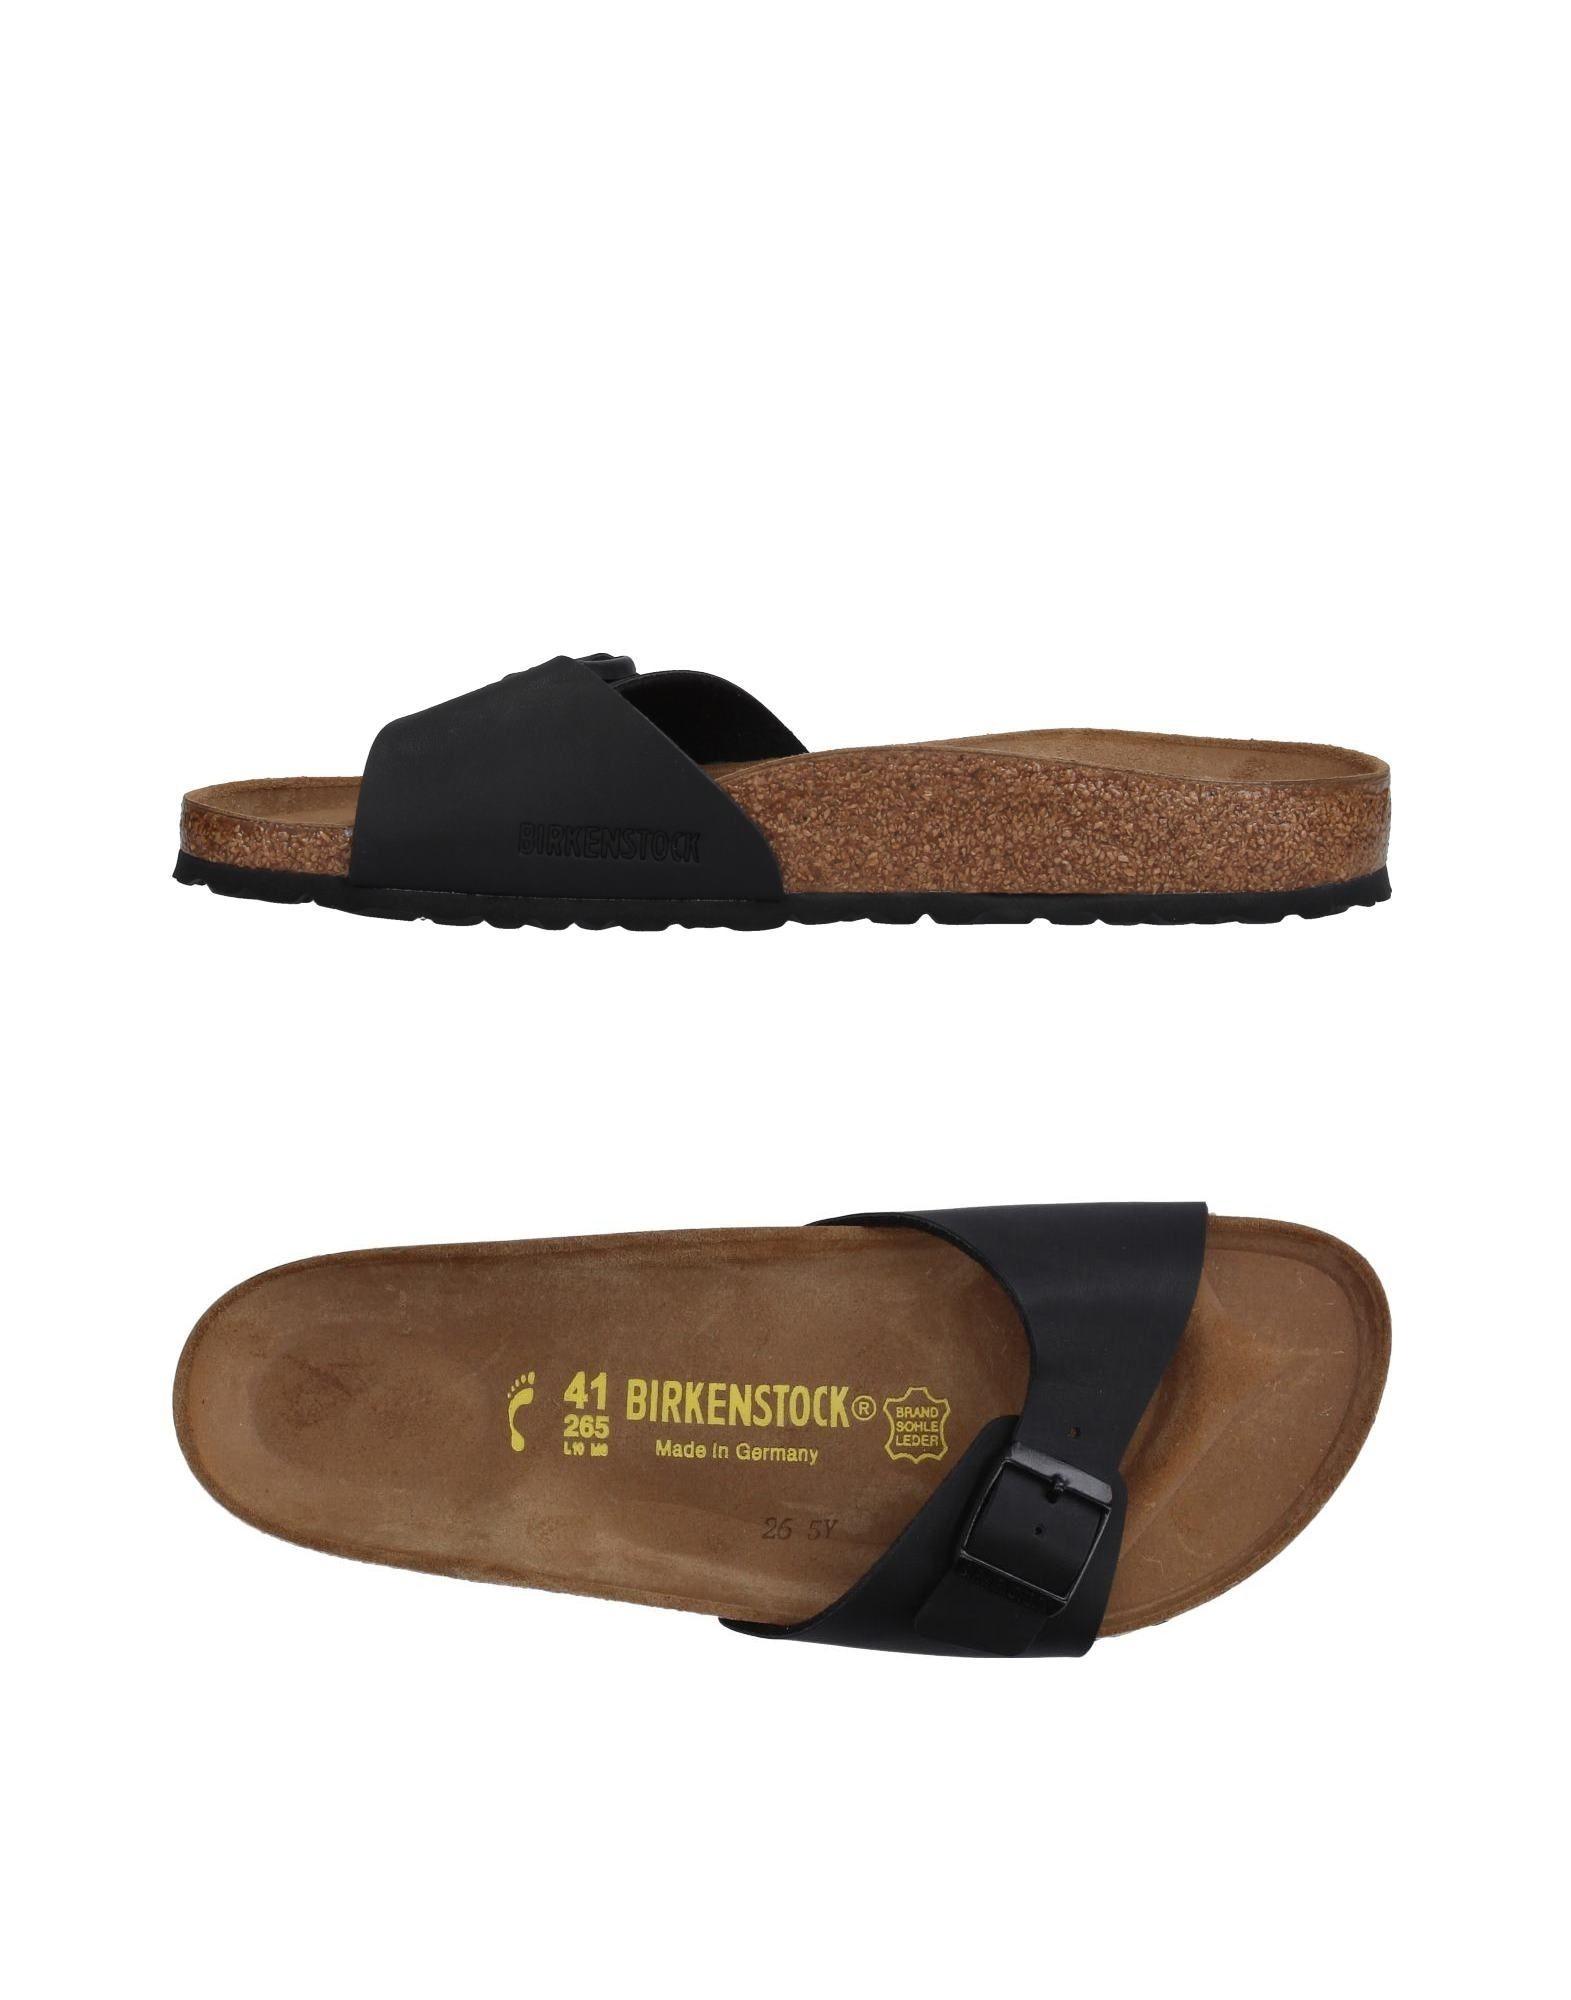 sandales tongs homme simili cuir jusqu 42 homme. Black Bedroom Furniture Sets. Home Design Ideas